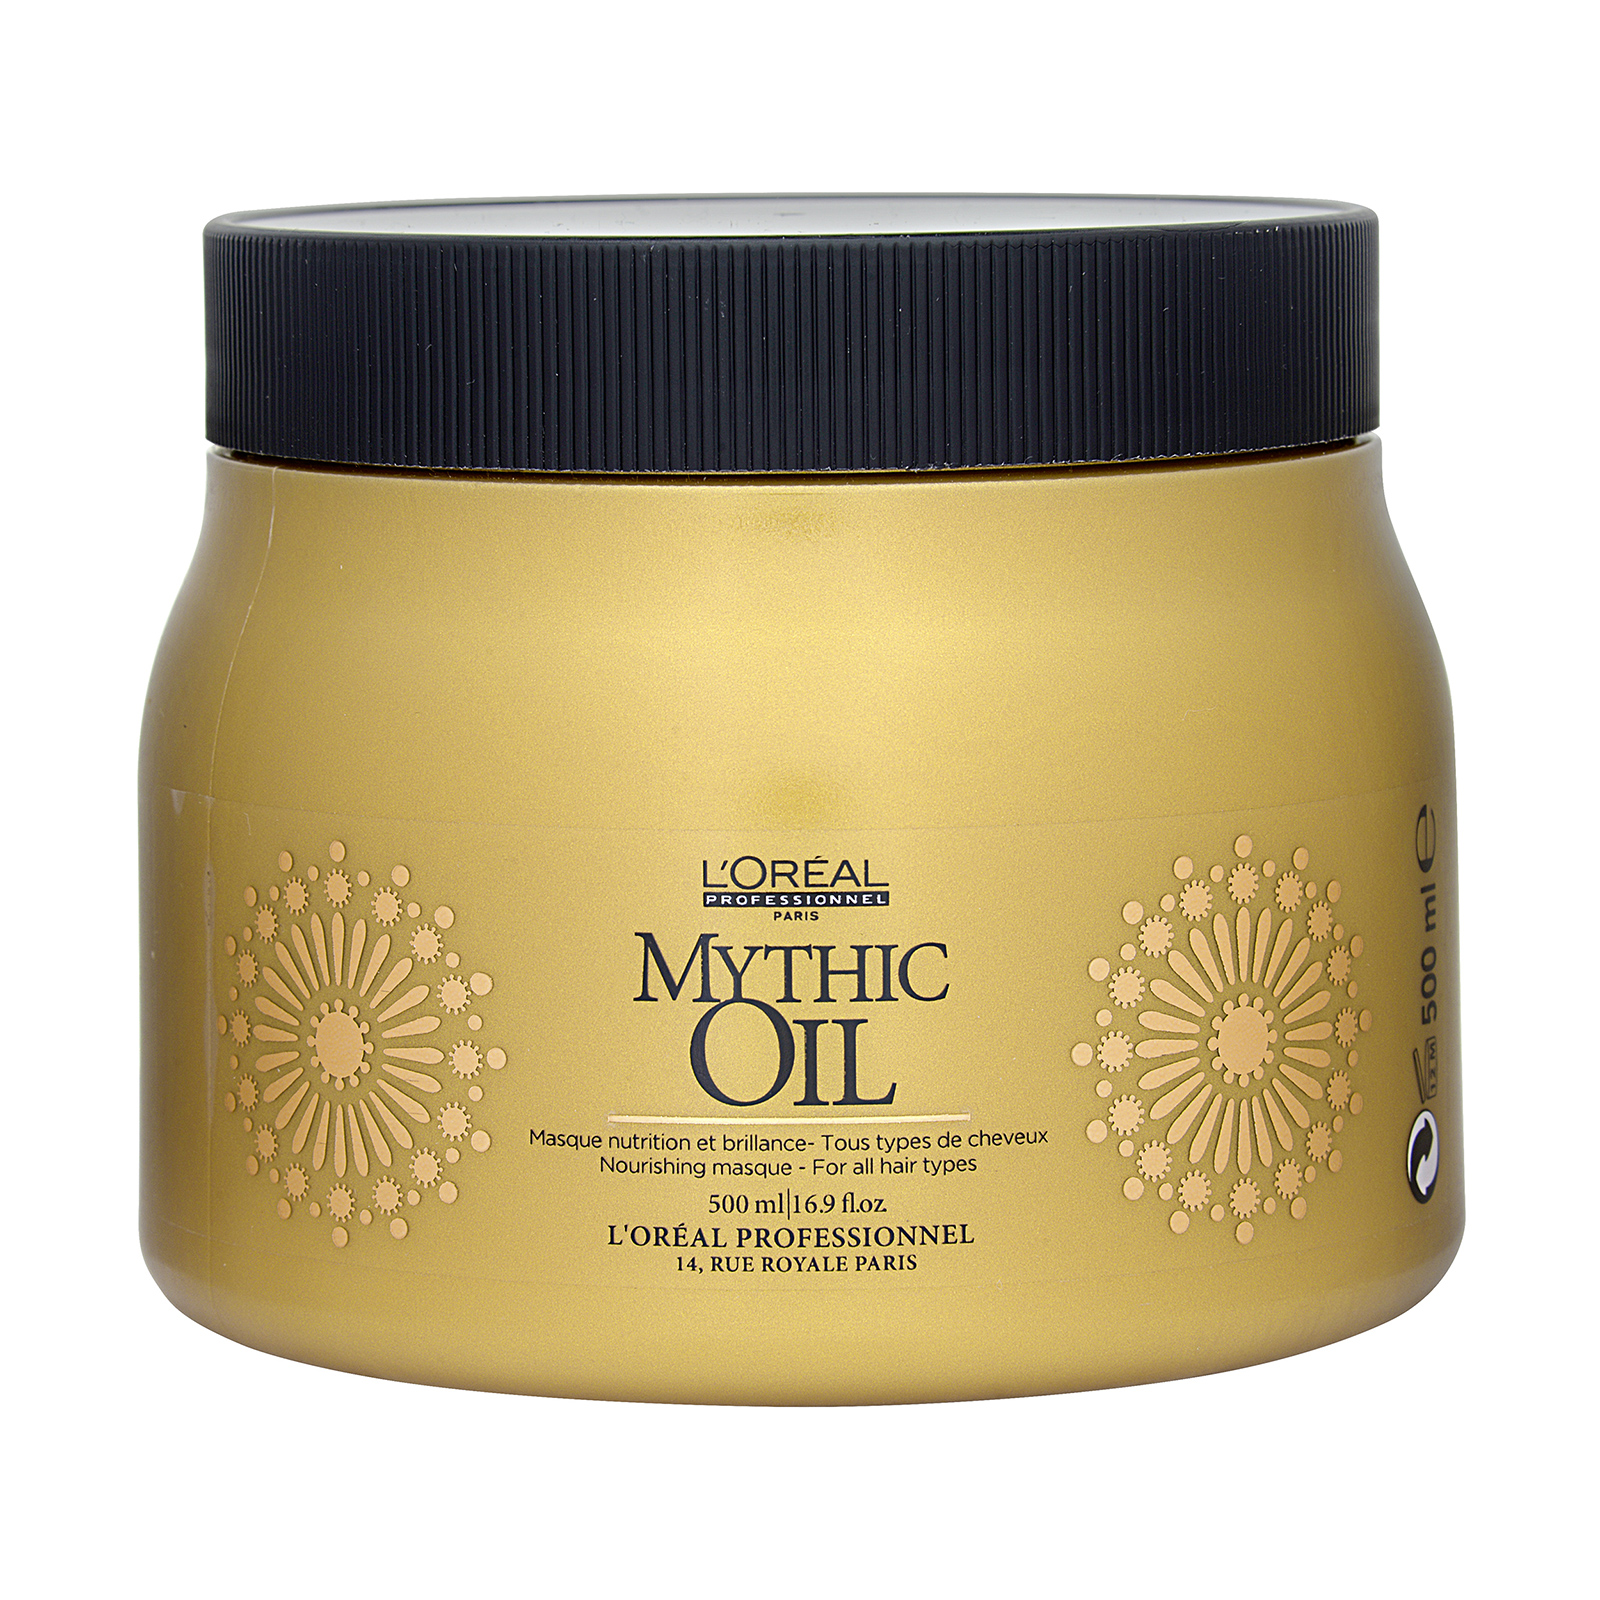 L'Oréal Paris Mythic Oil  Nourishing Masque (For All Hair Types) 16.9oz, 500ml